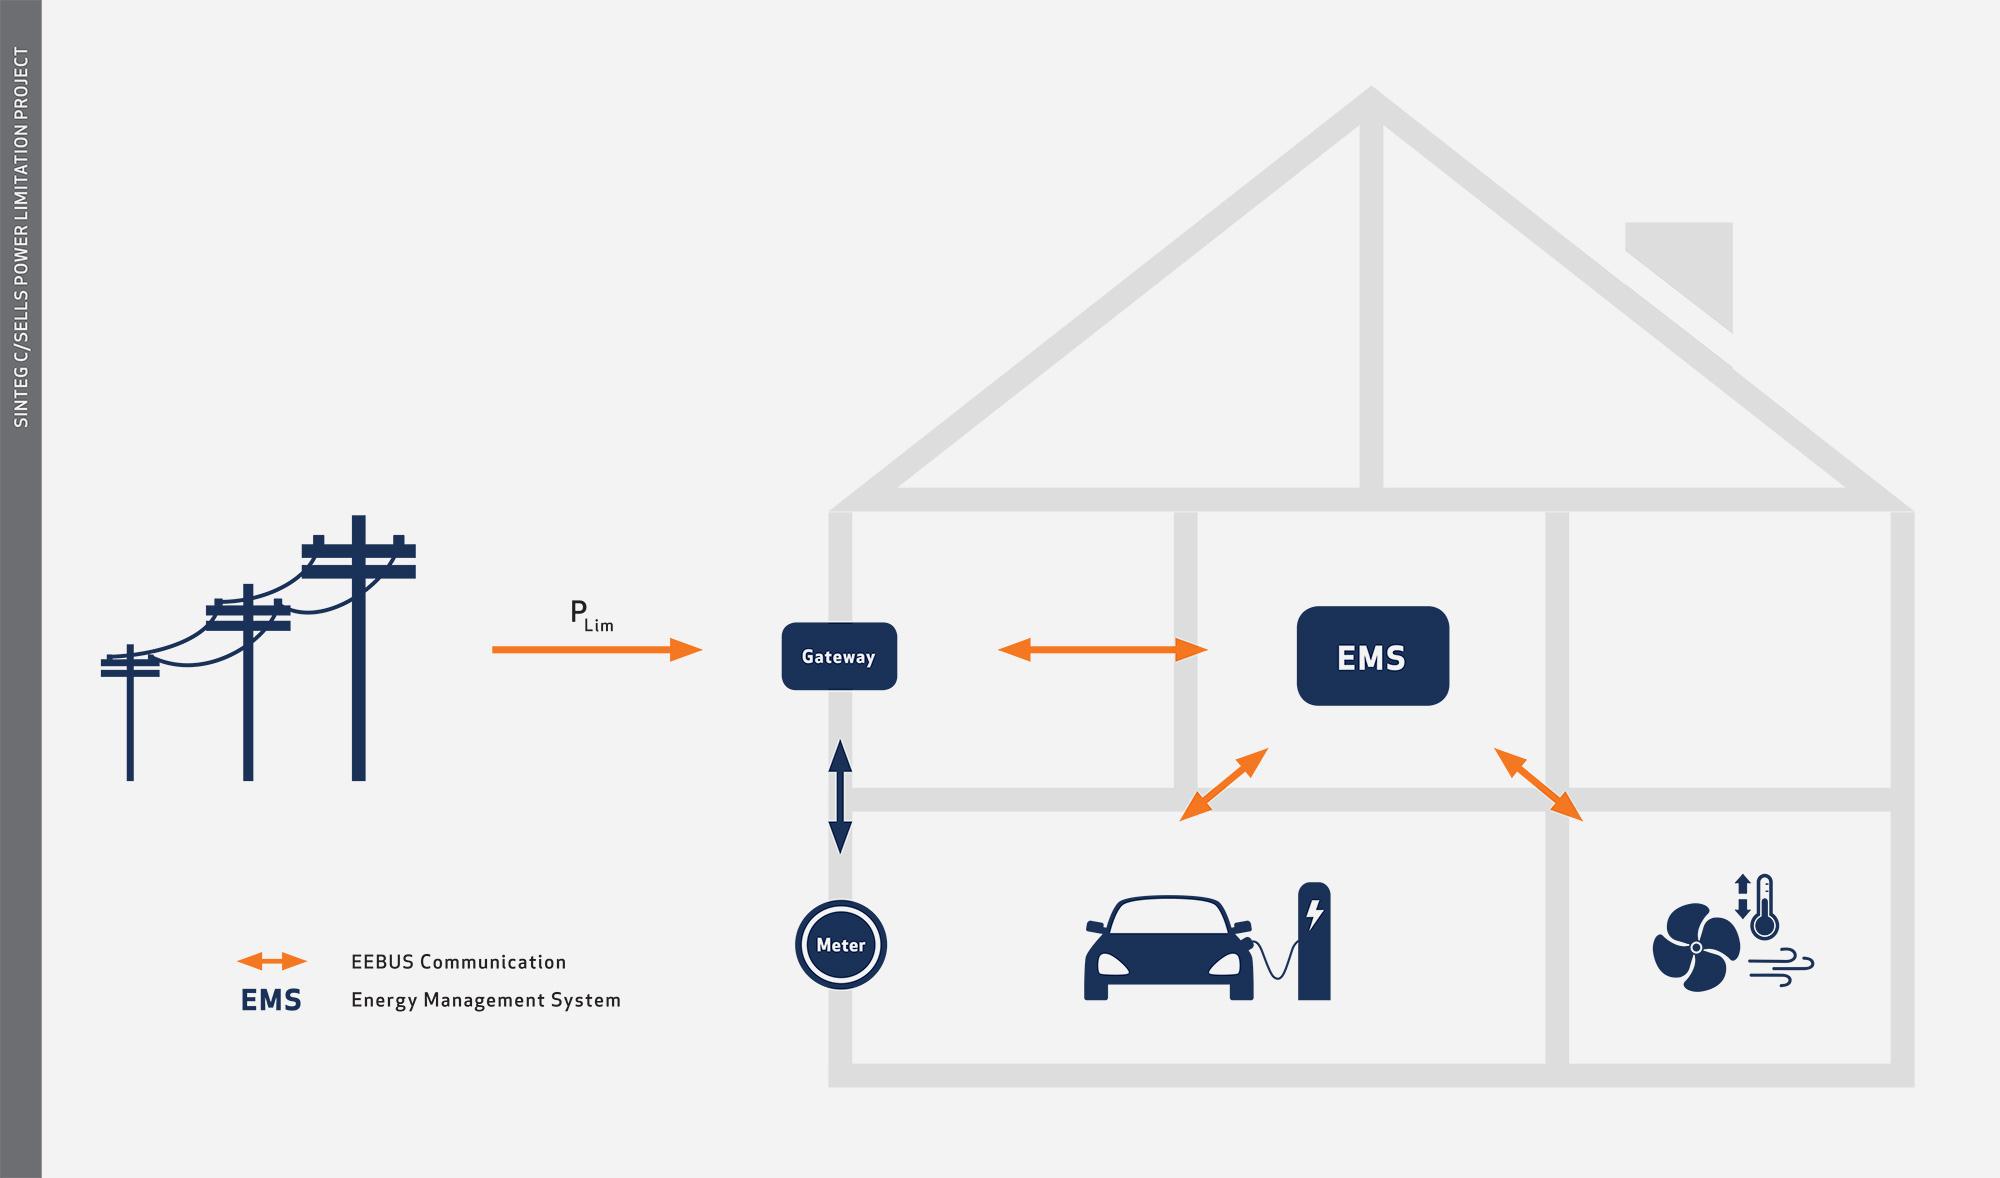 EEBUS Communicatin Grid Devices Limitation